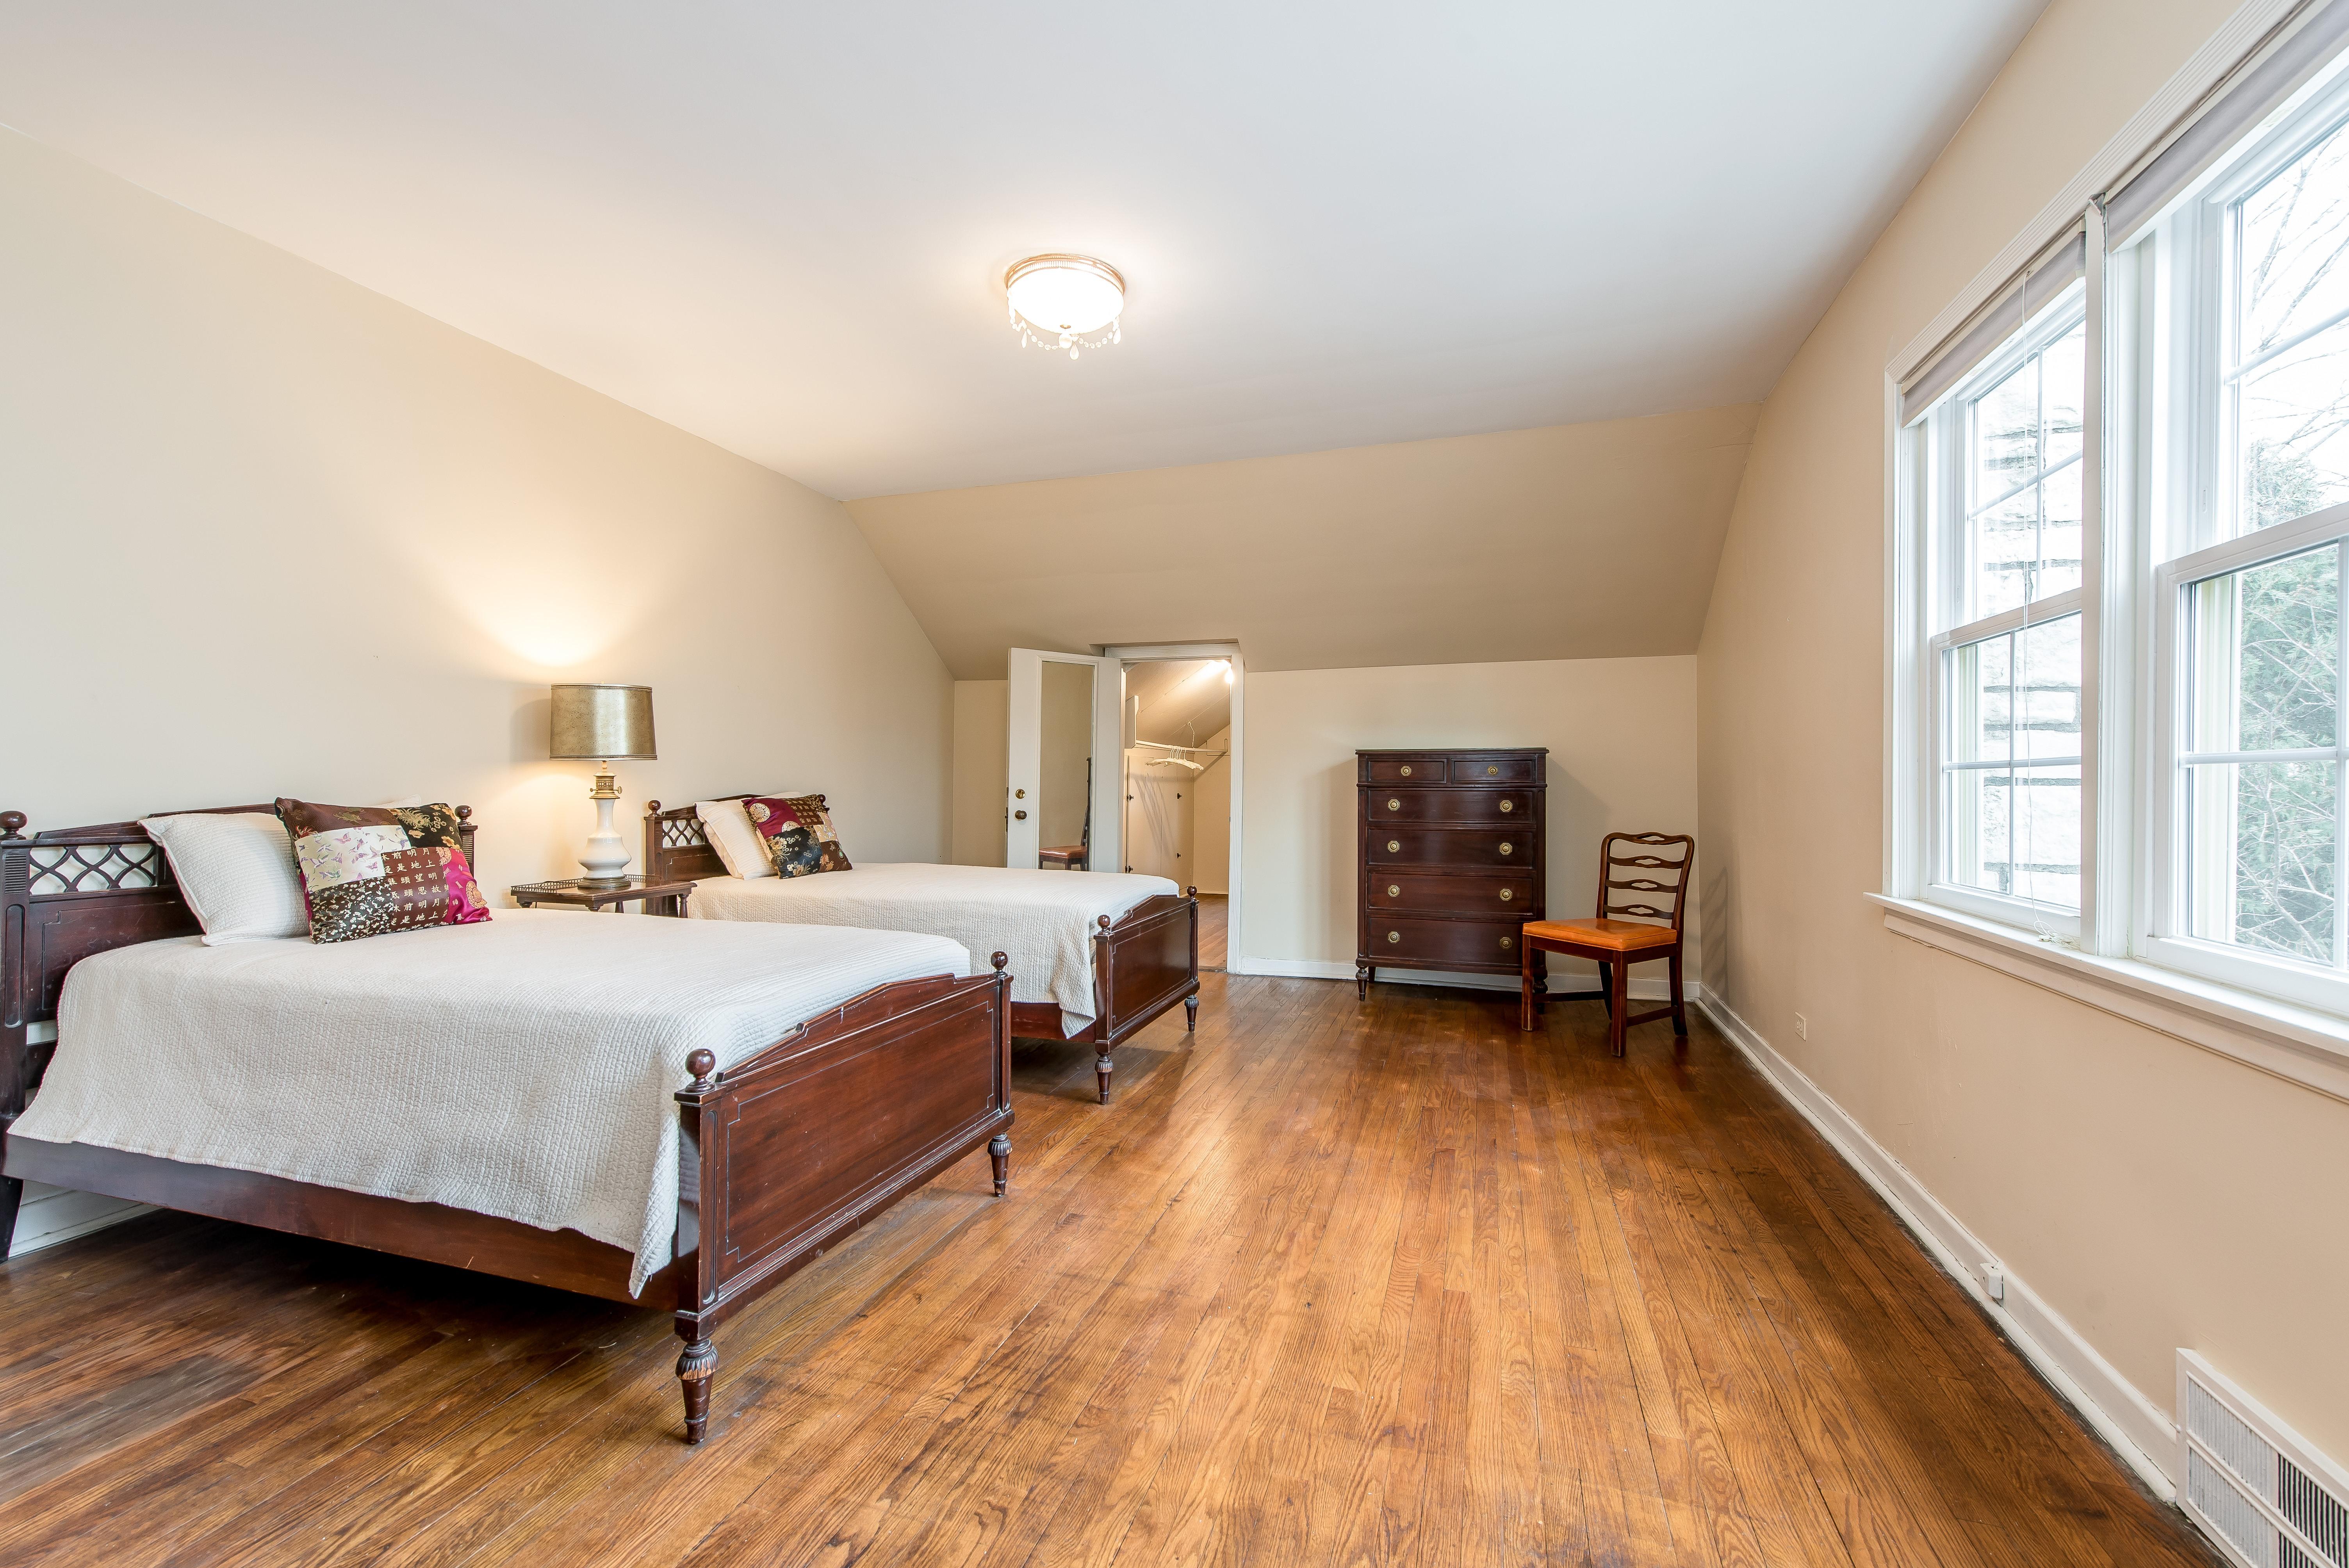 2151 Thornwood master bedroom